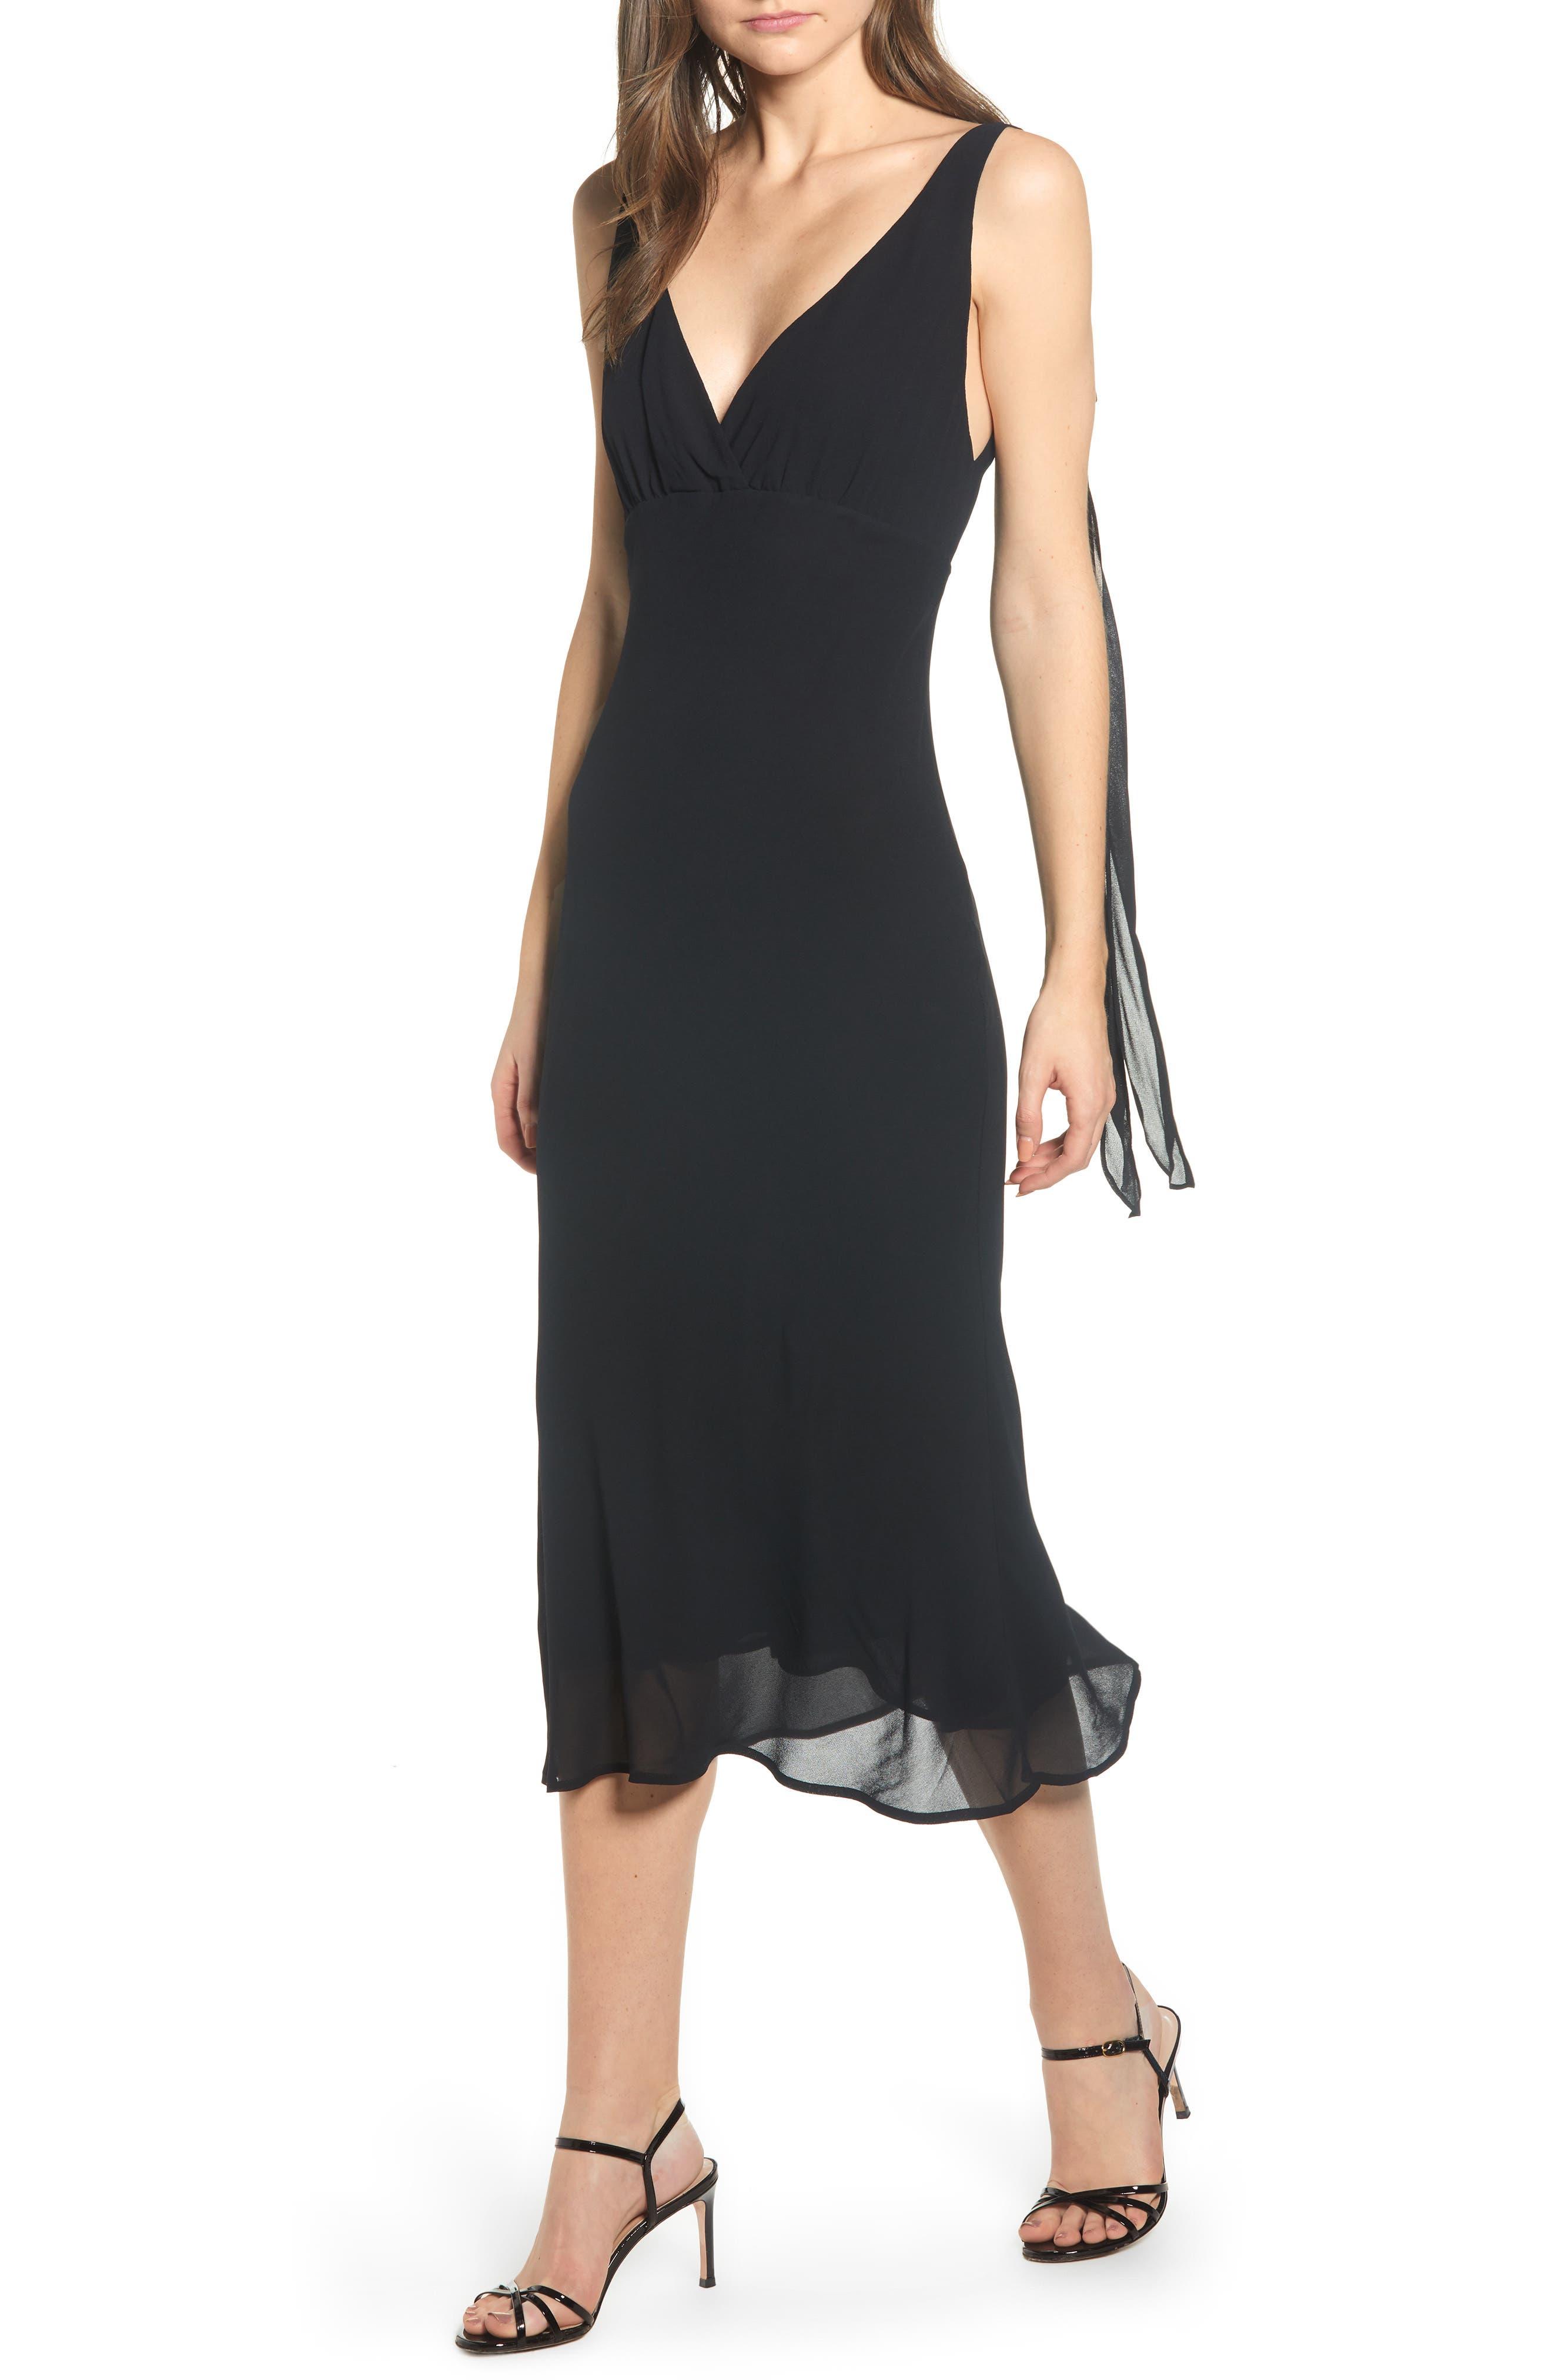 REFORMATION, Venezia Dress, Main thumbnail 1, color, BLACK